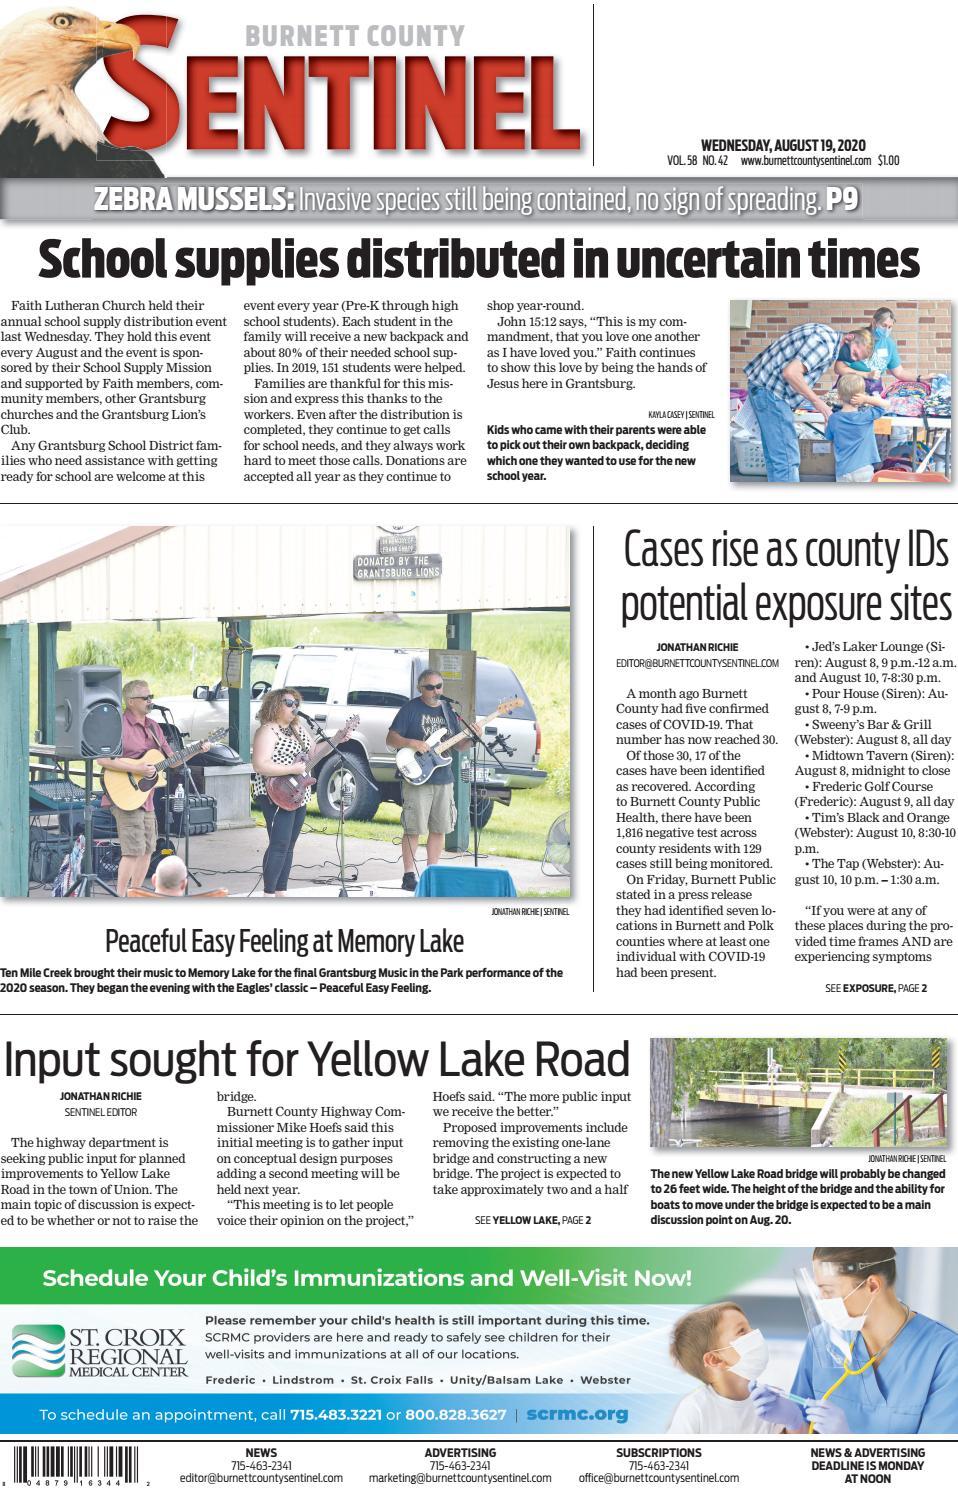 Burnett County Sentinel August 19 2020 By Burnett County Sentinel Issuu